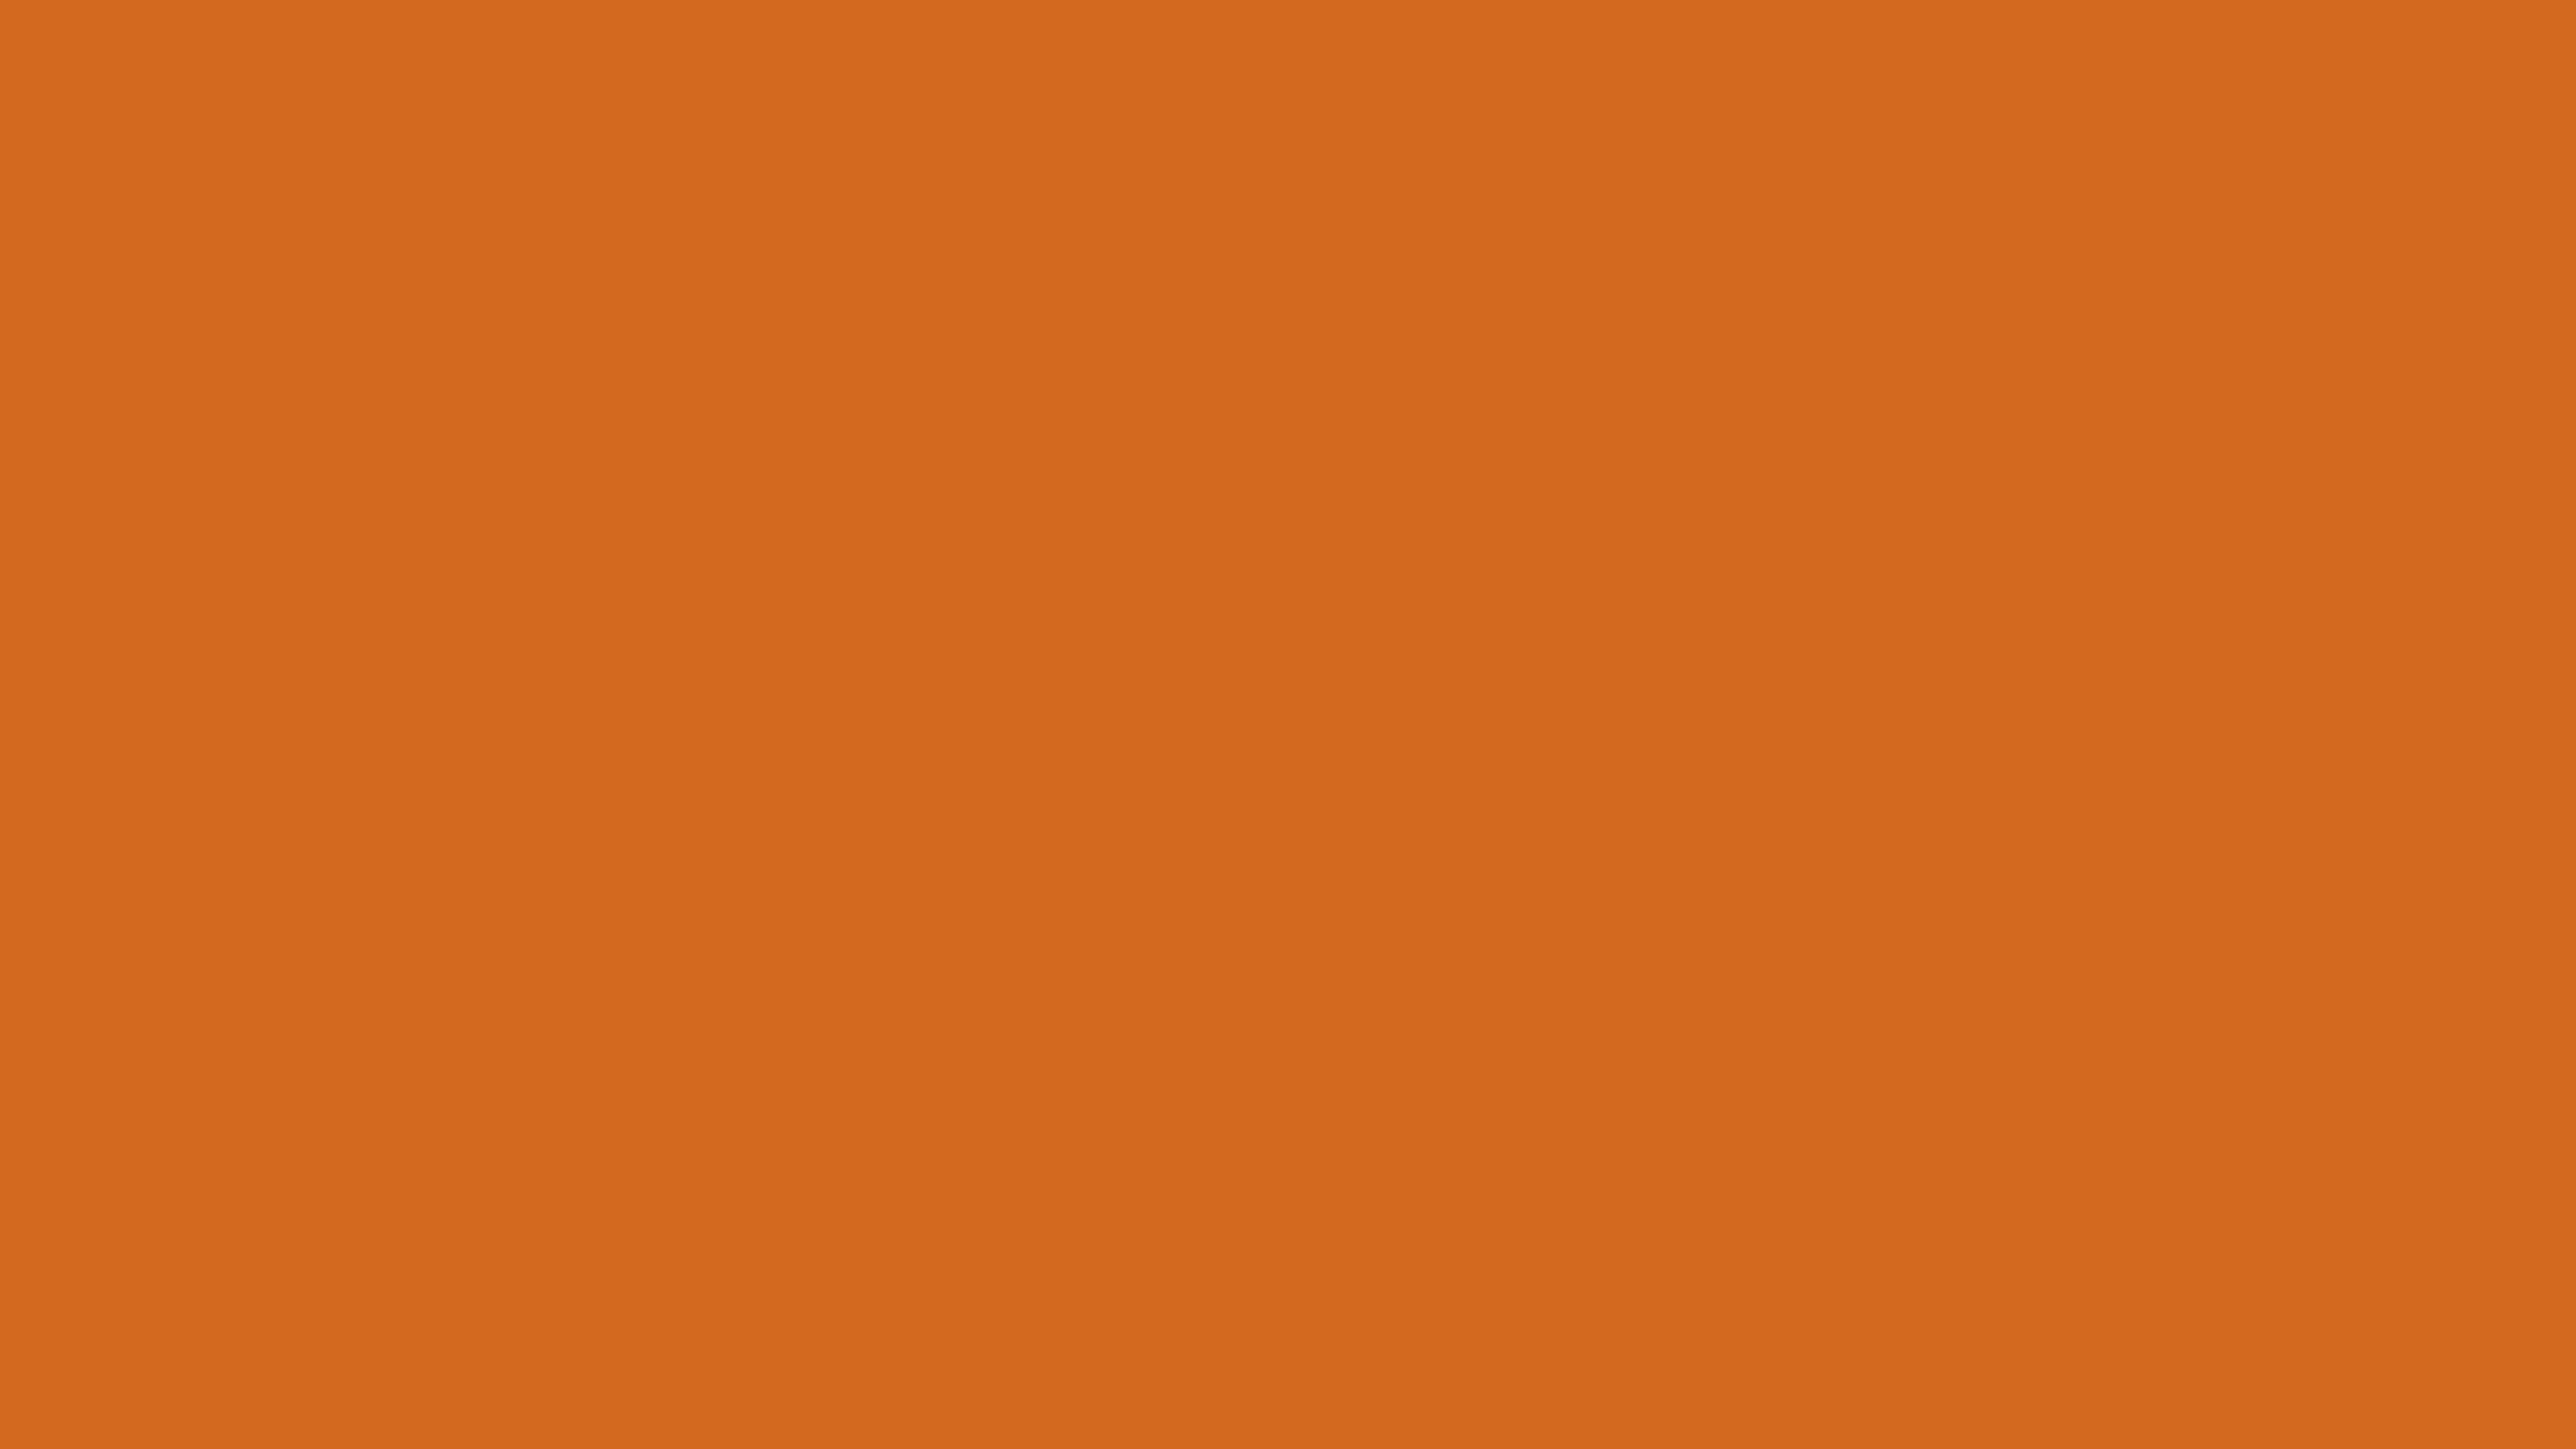 4096x2304 Cinnamon Solid Color Background